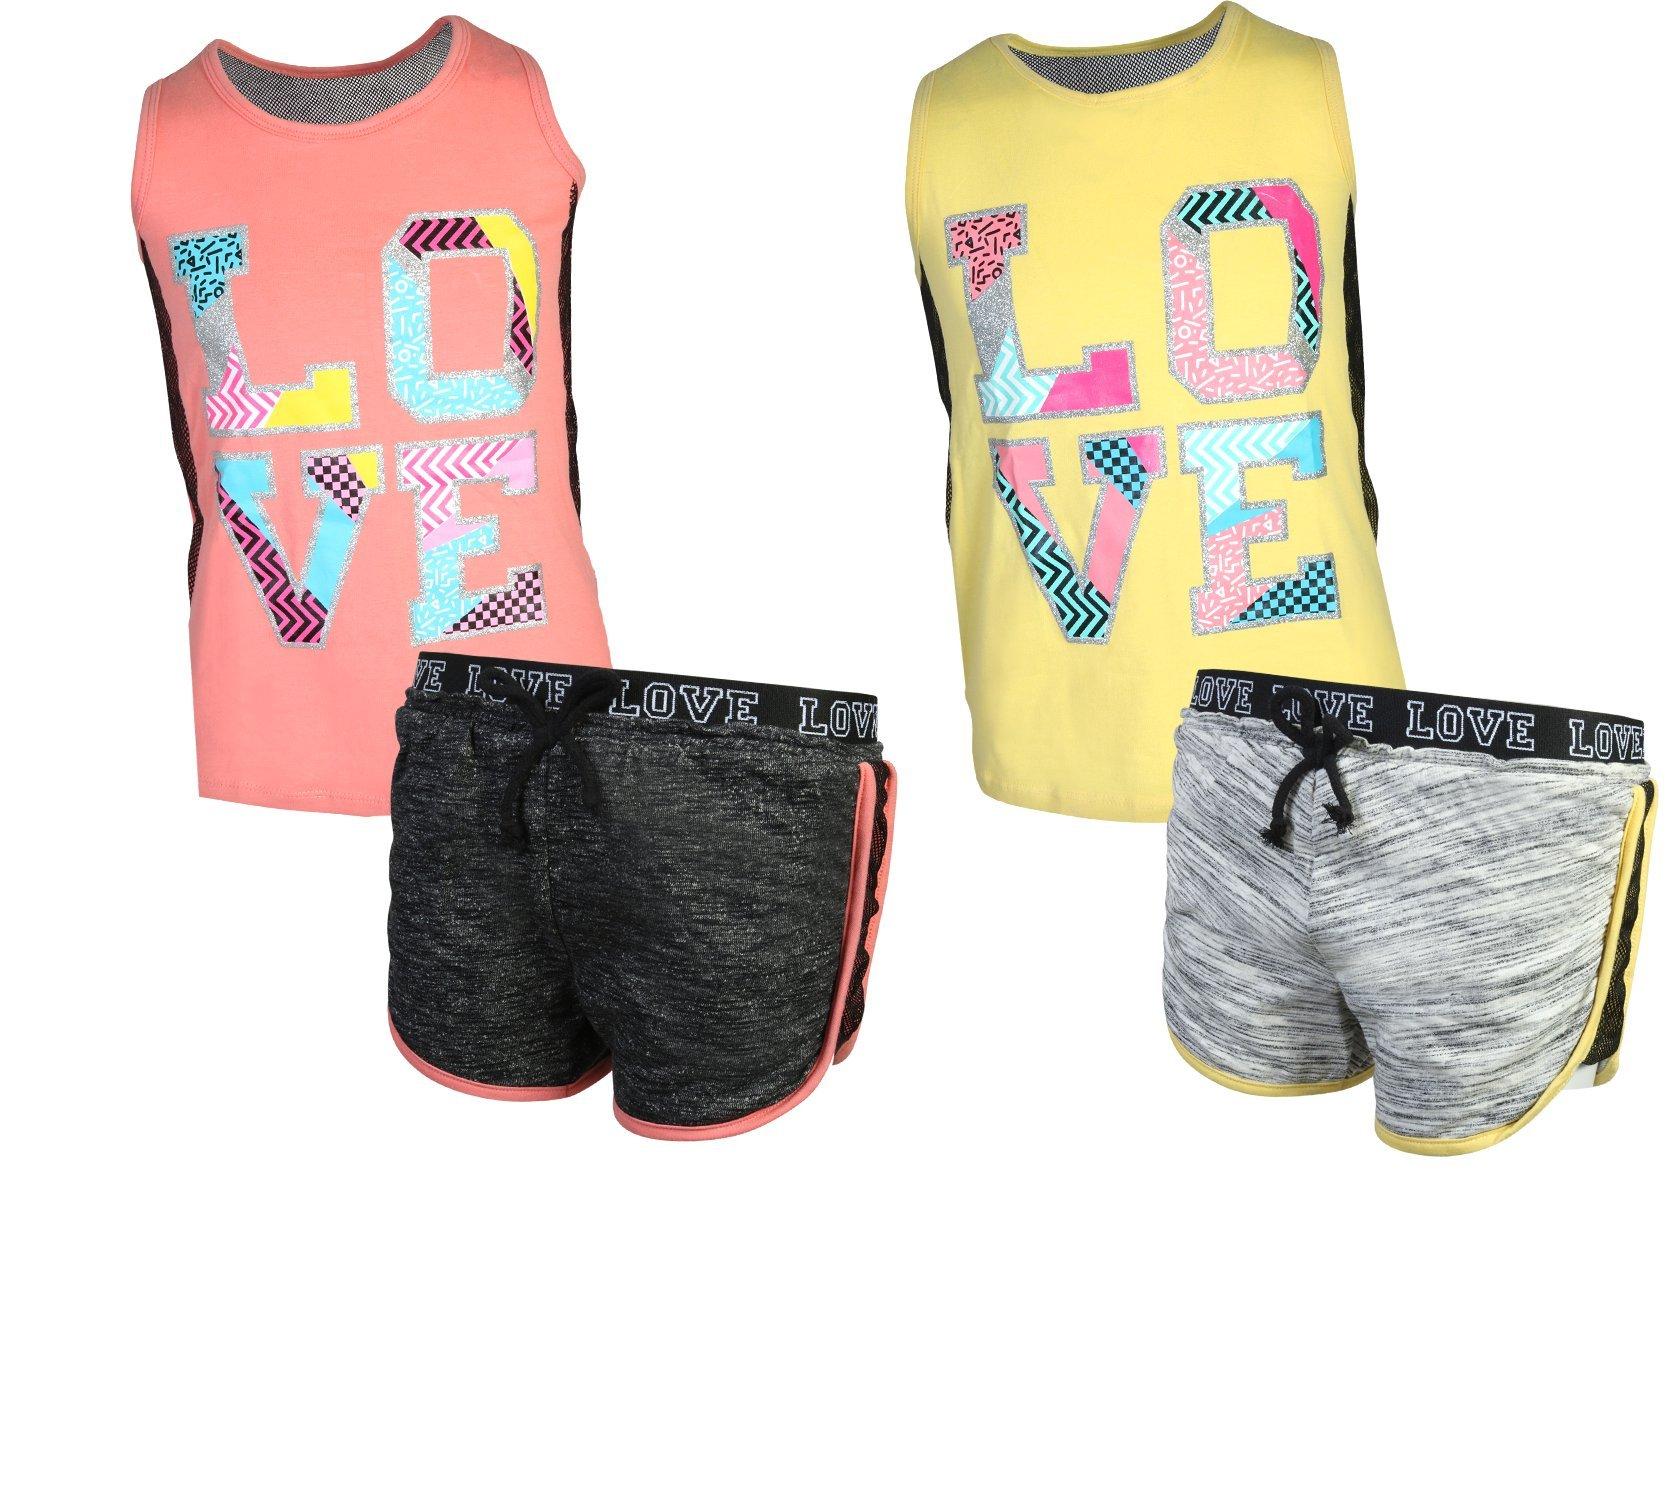 'Girl's 4-Piece Fashion Active Short Sets, Love, Size 7/8'